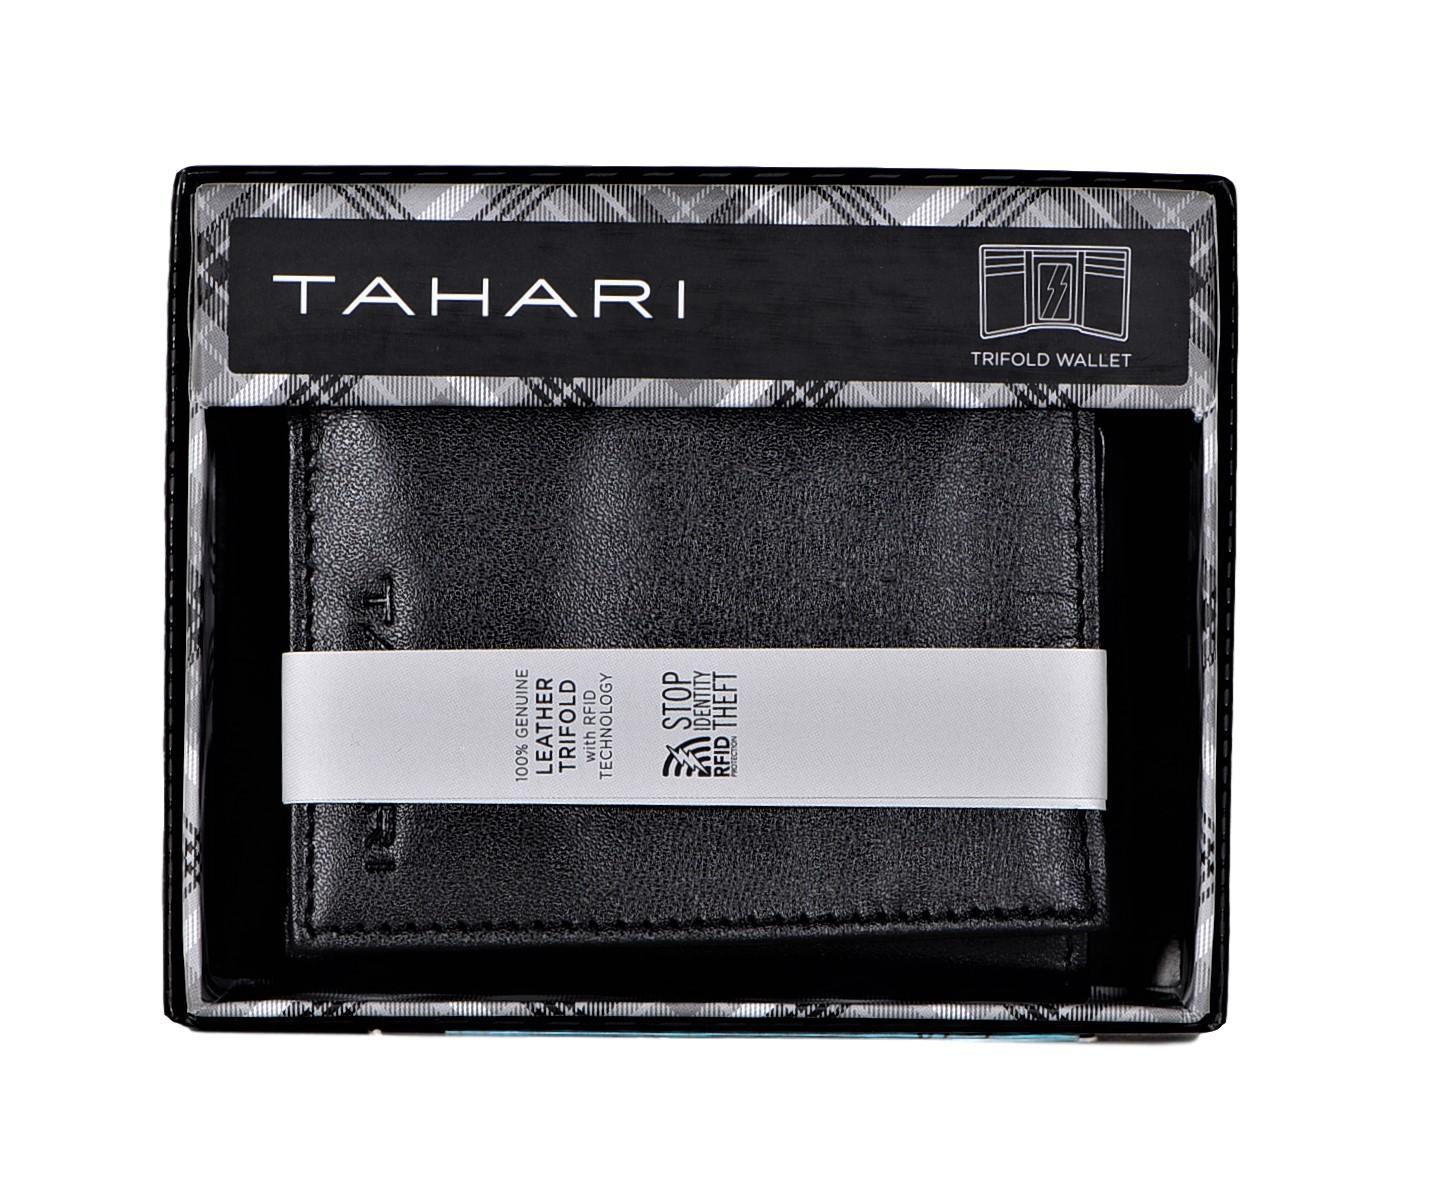 Tahari-Men-039-s-RFID-Security-Blocking-Leather-Glove-Trifold-Wallet thumbnail 10